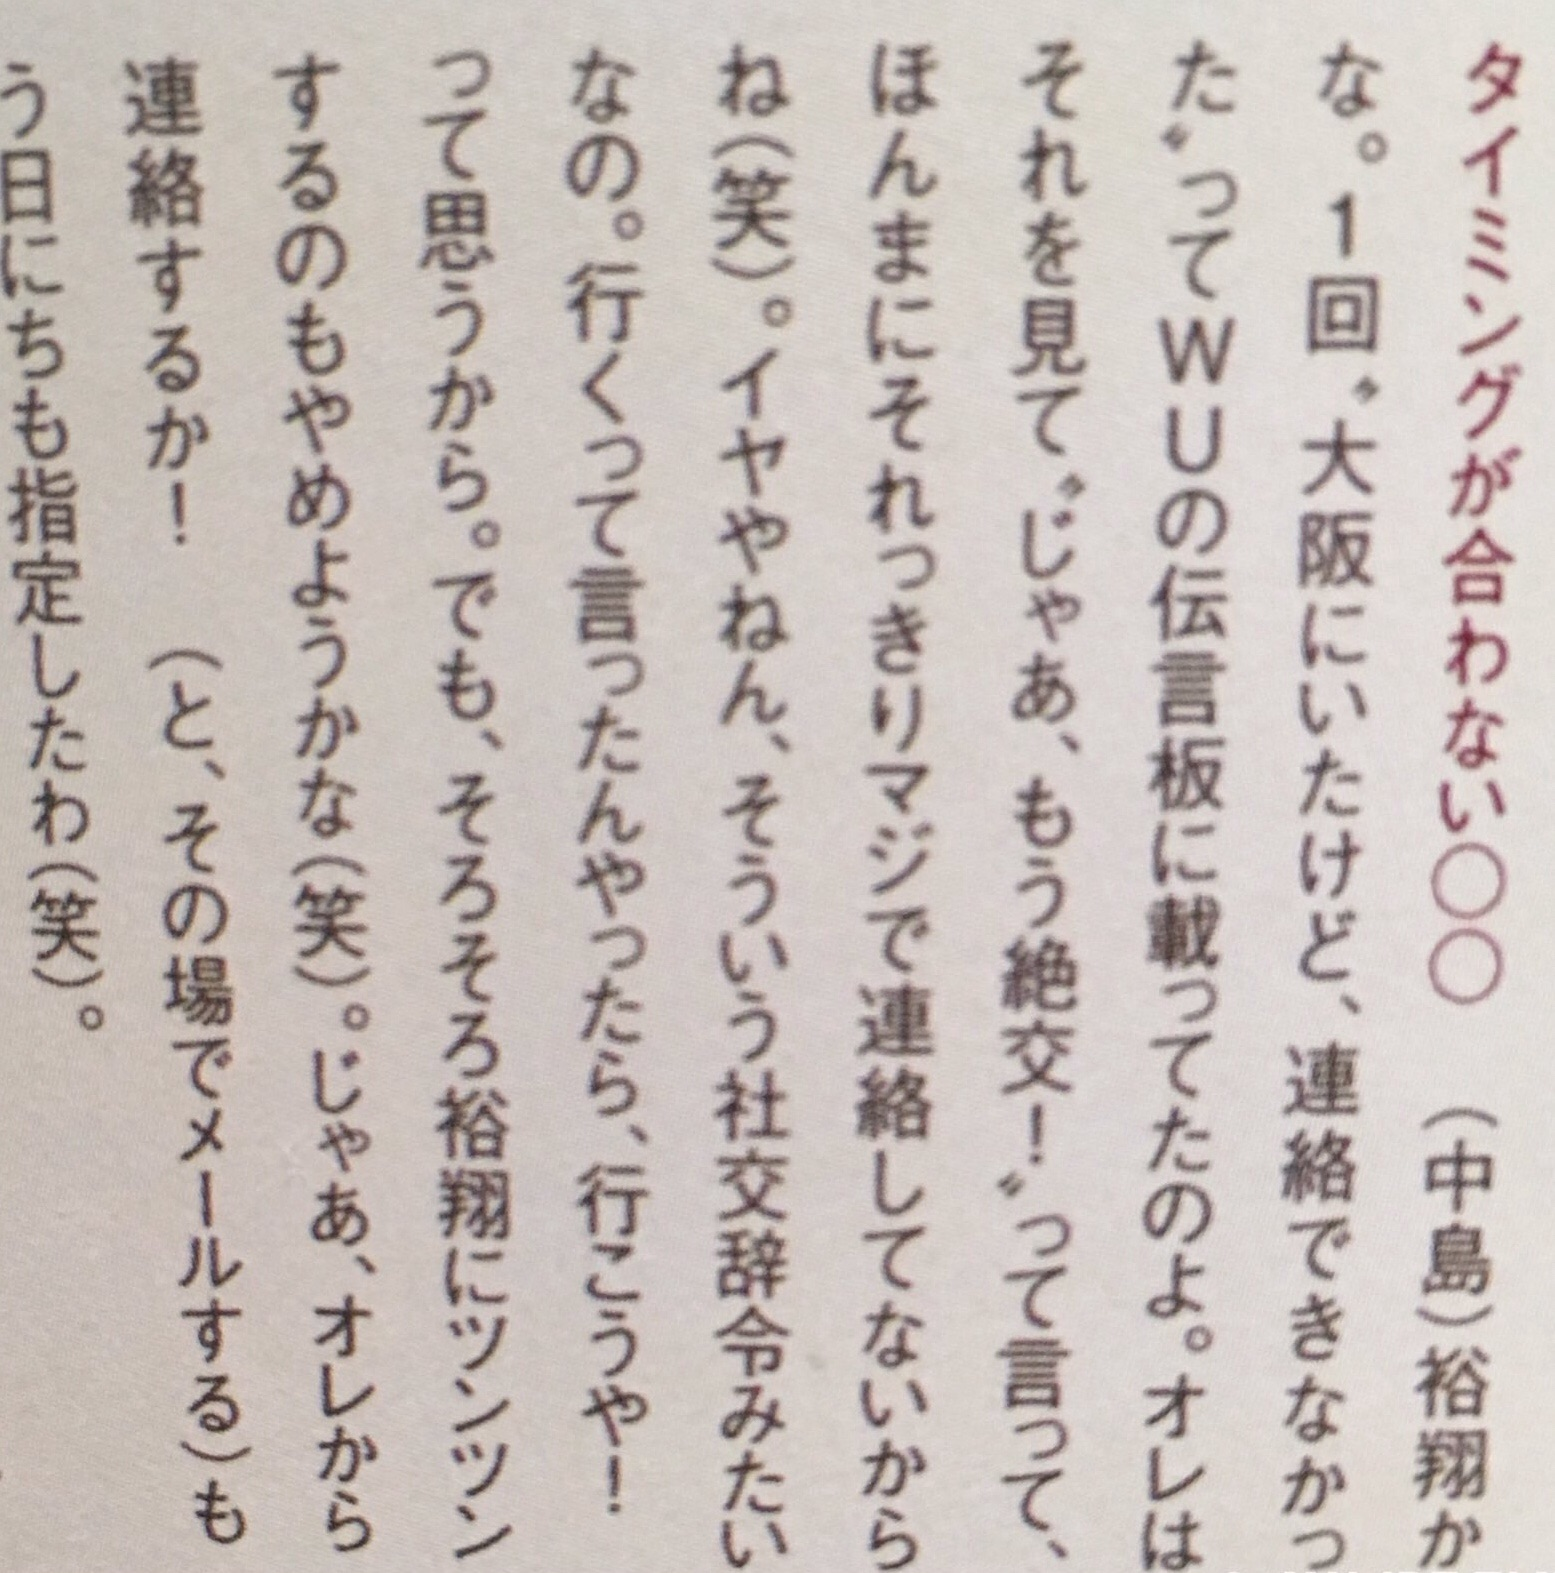 f:id:inoino_shigeshige:20161027195452j:image